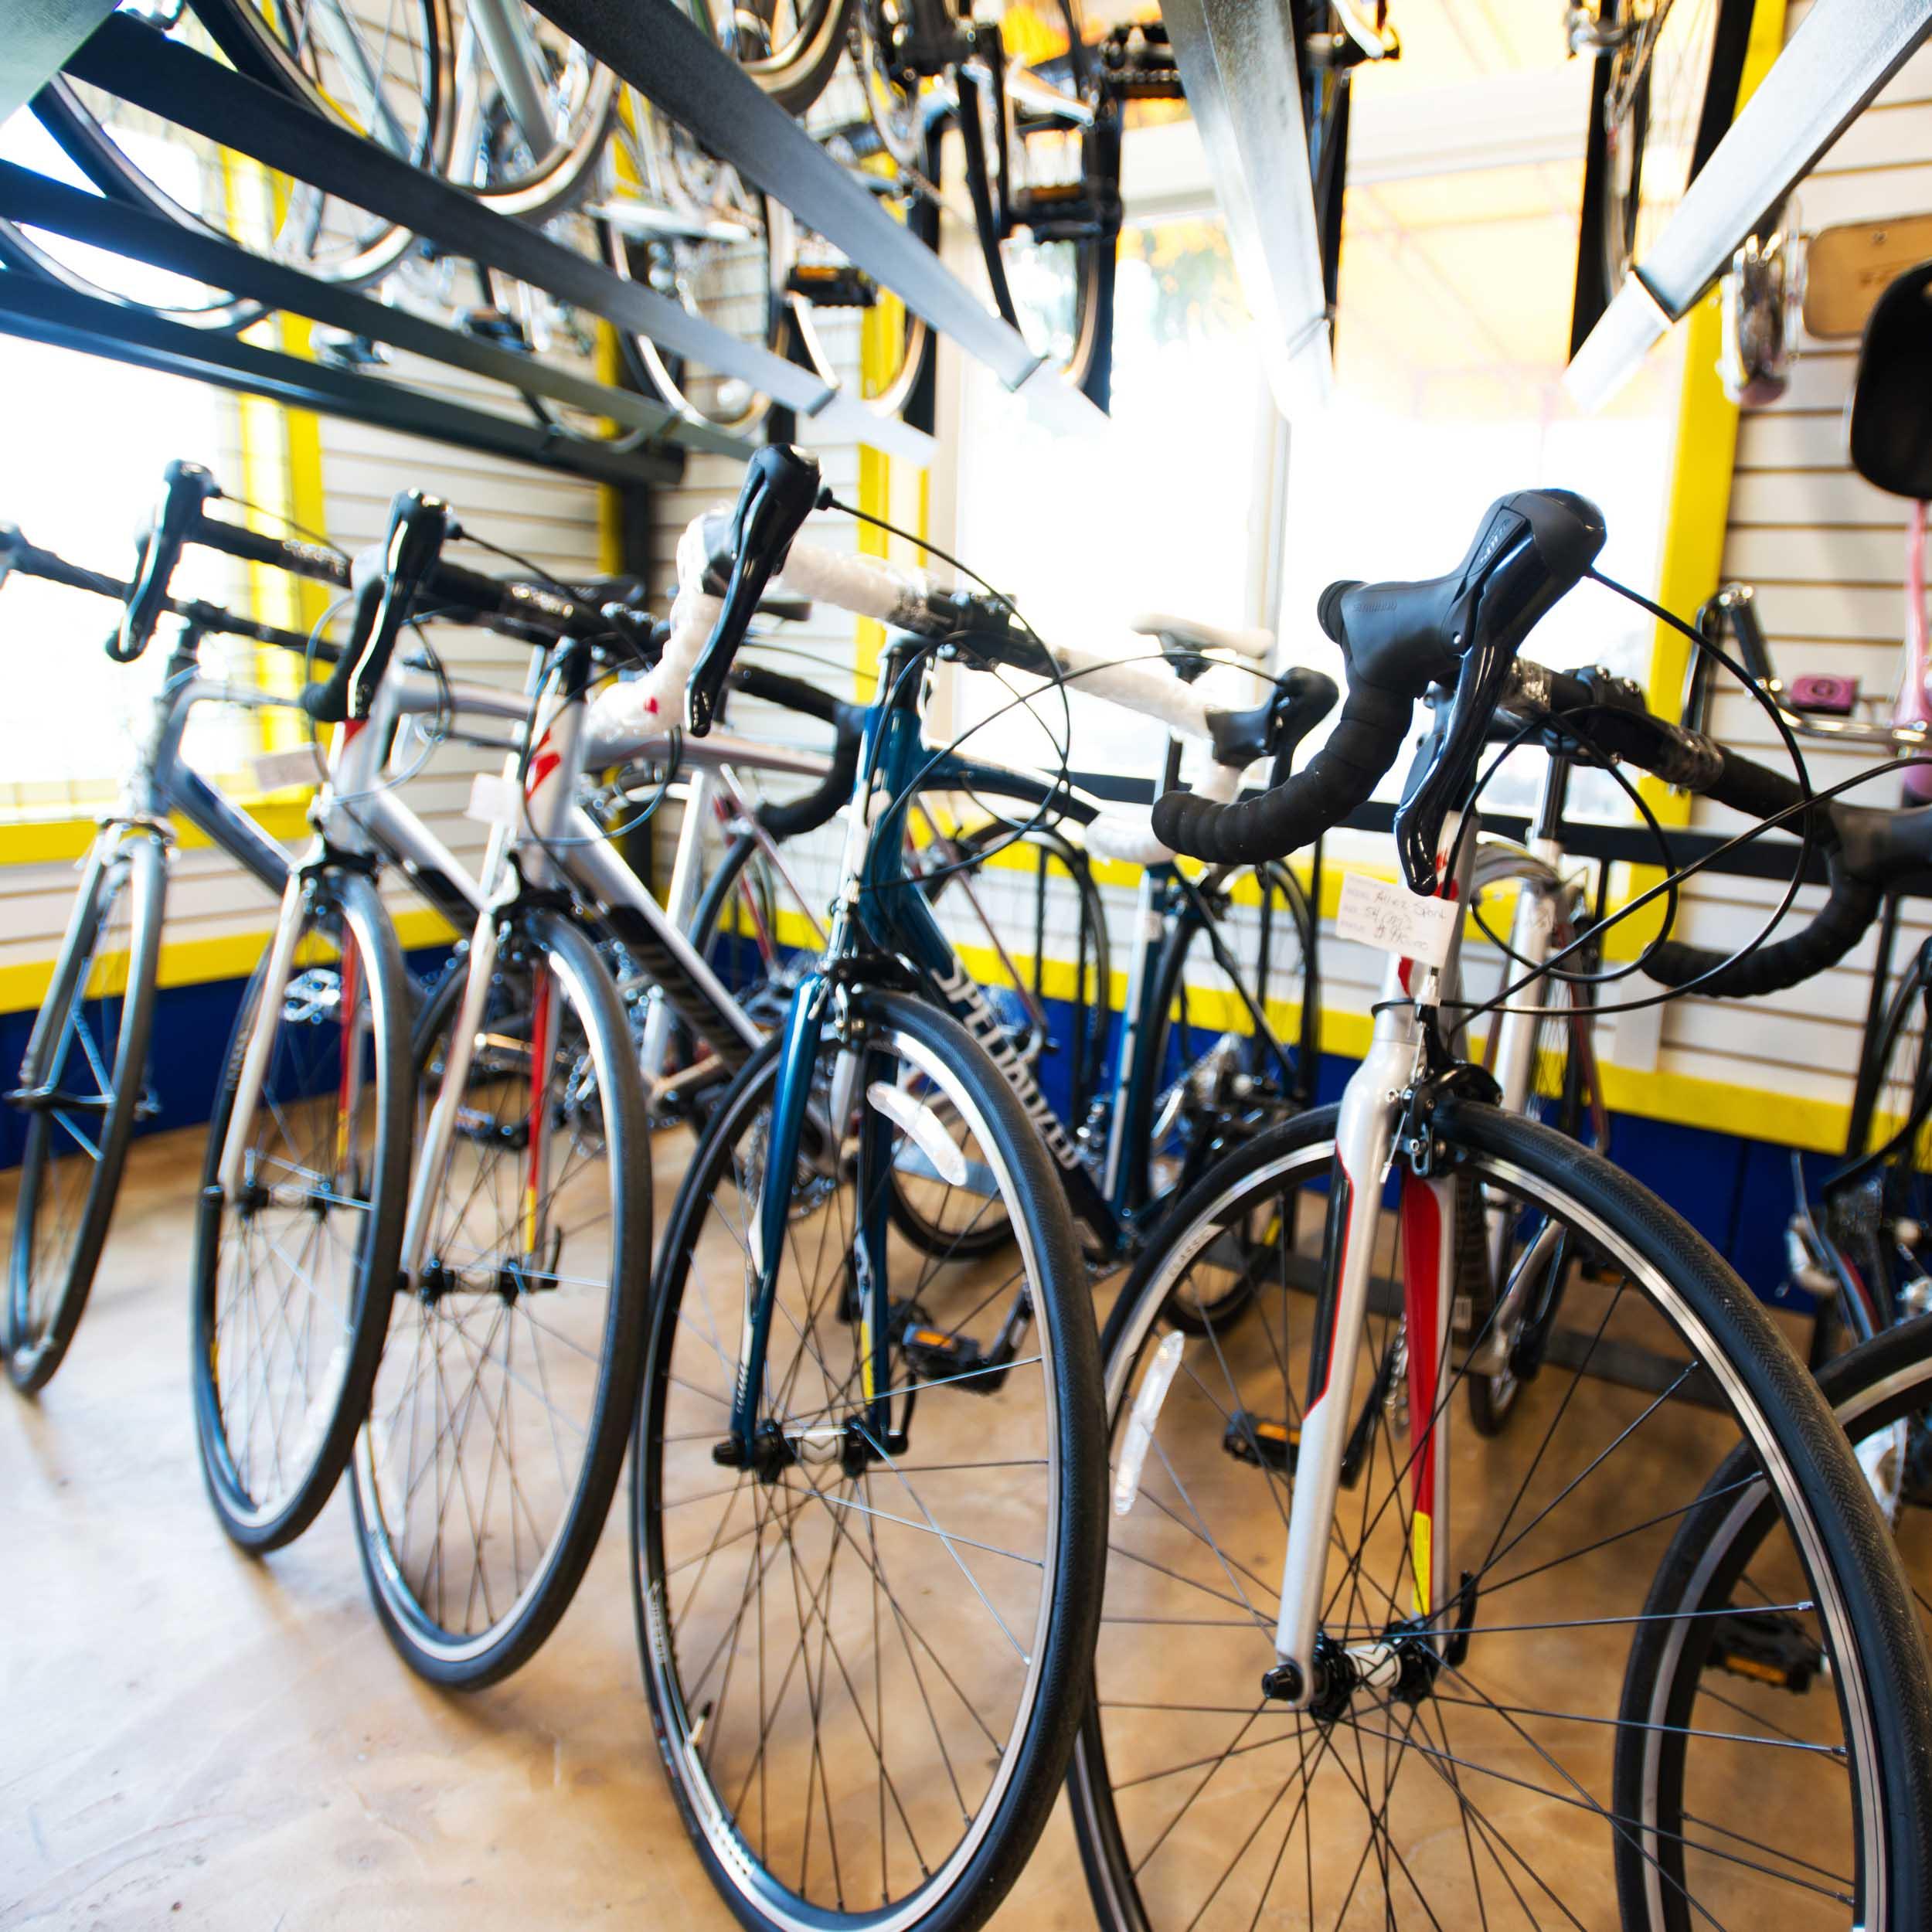 kman_cyclery_road_bikes_shop_crop_w.jpg